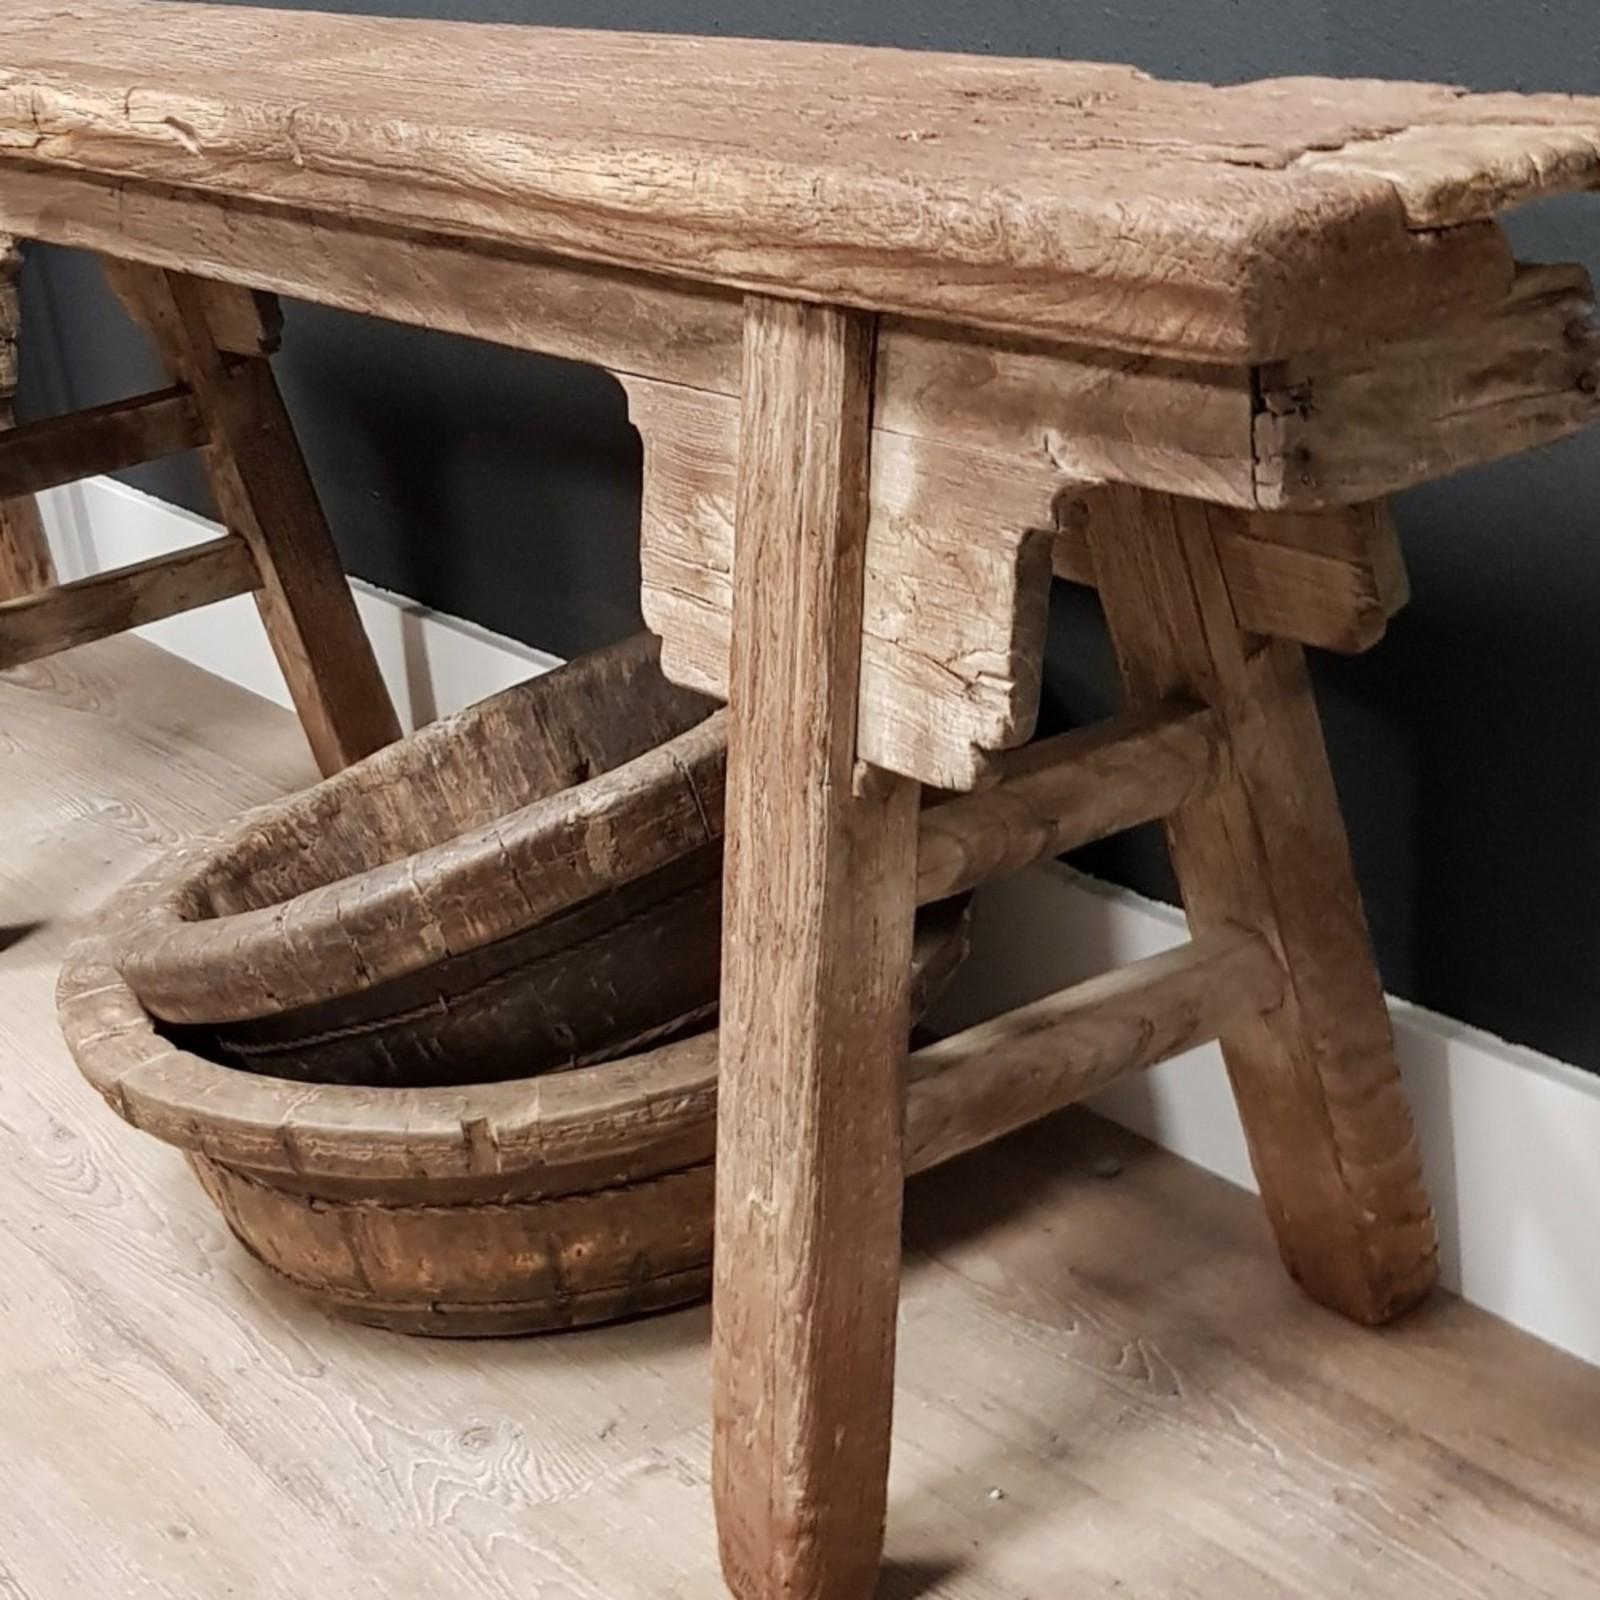 Luksa Uniek antiek houten bankje